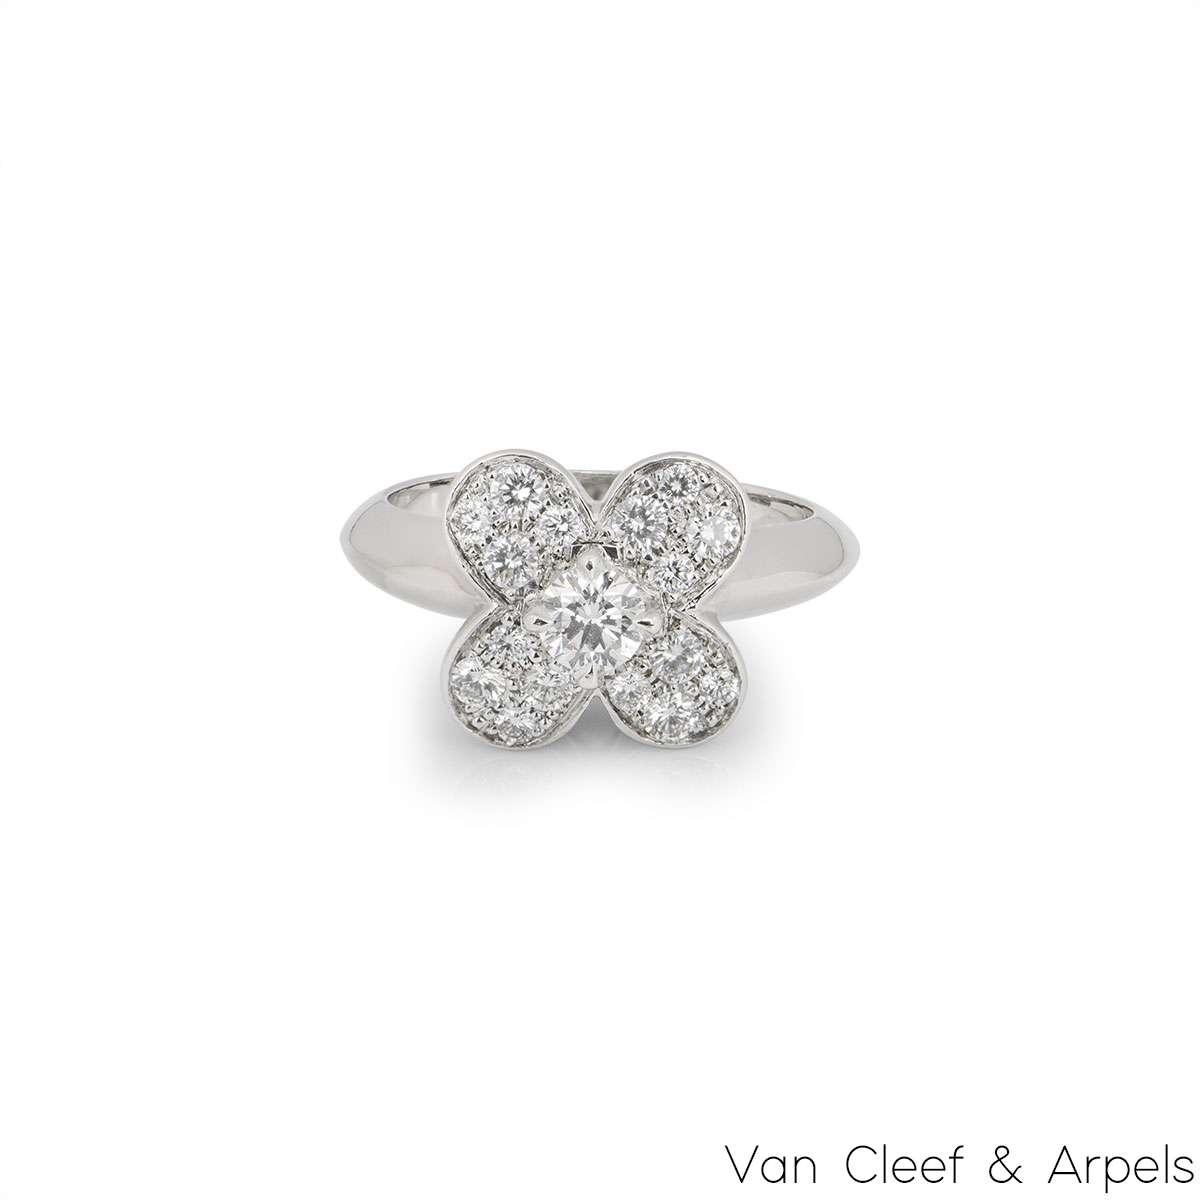 Van Cleef & Arpels White Gold Diamond Trefle Ring